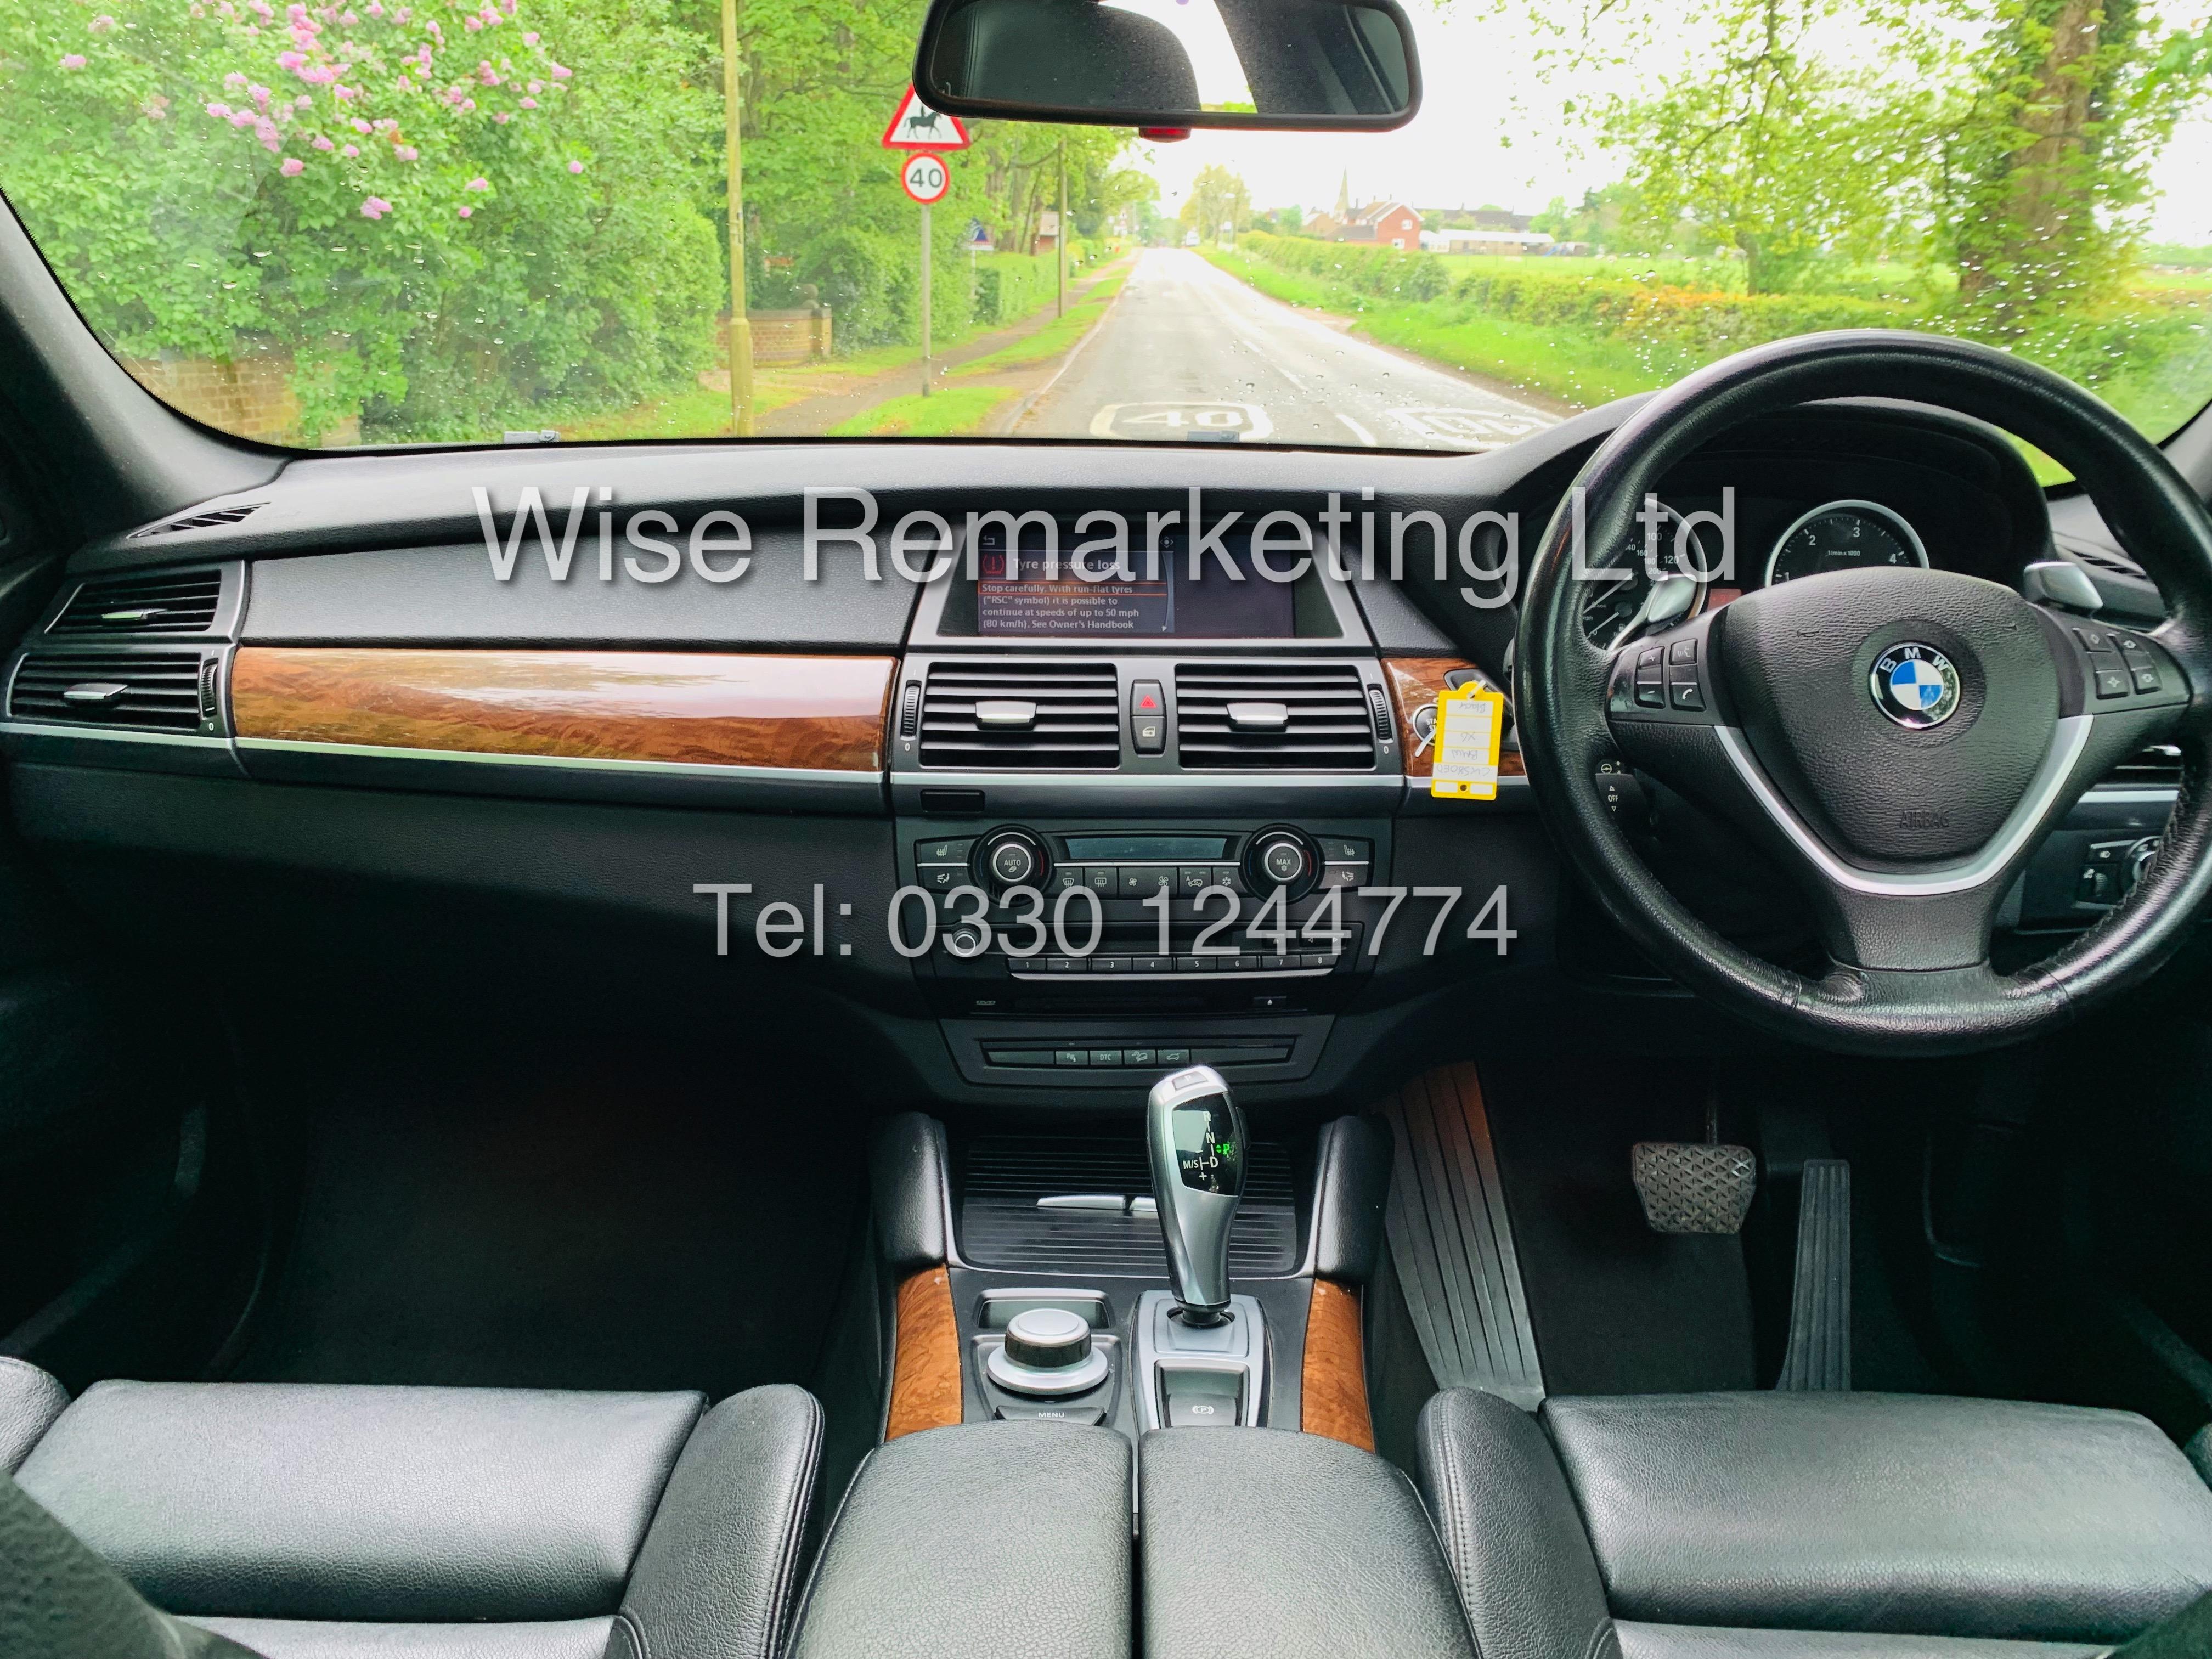 BMW X6 XDRIVE 35D AUTO (2009 SPEC) *1 PREVIOUS OWNER* PARKING AID - SAT NAV - FSH - Image 14 of 25